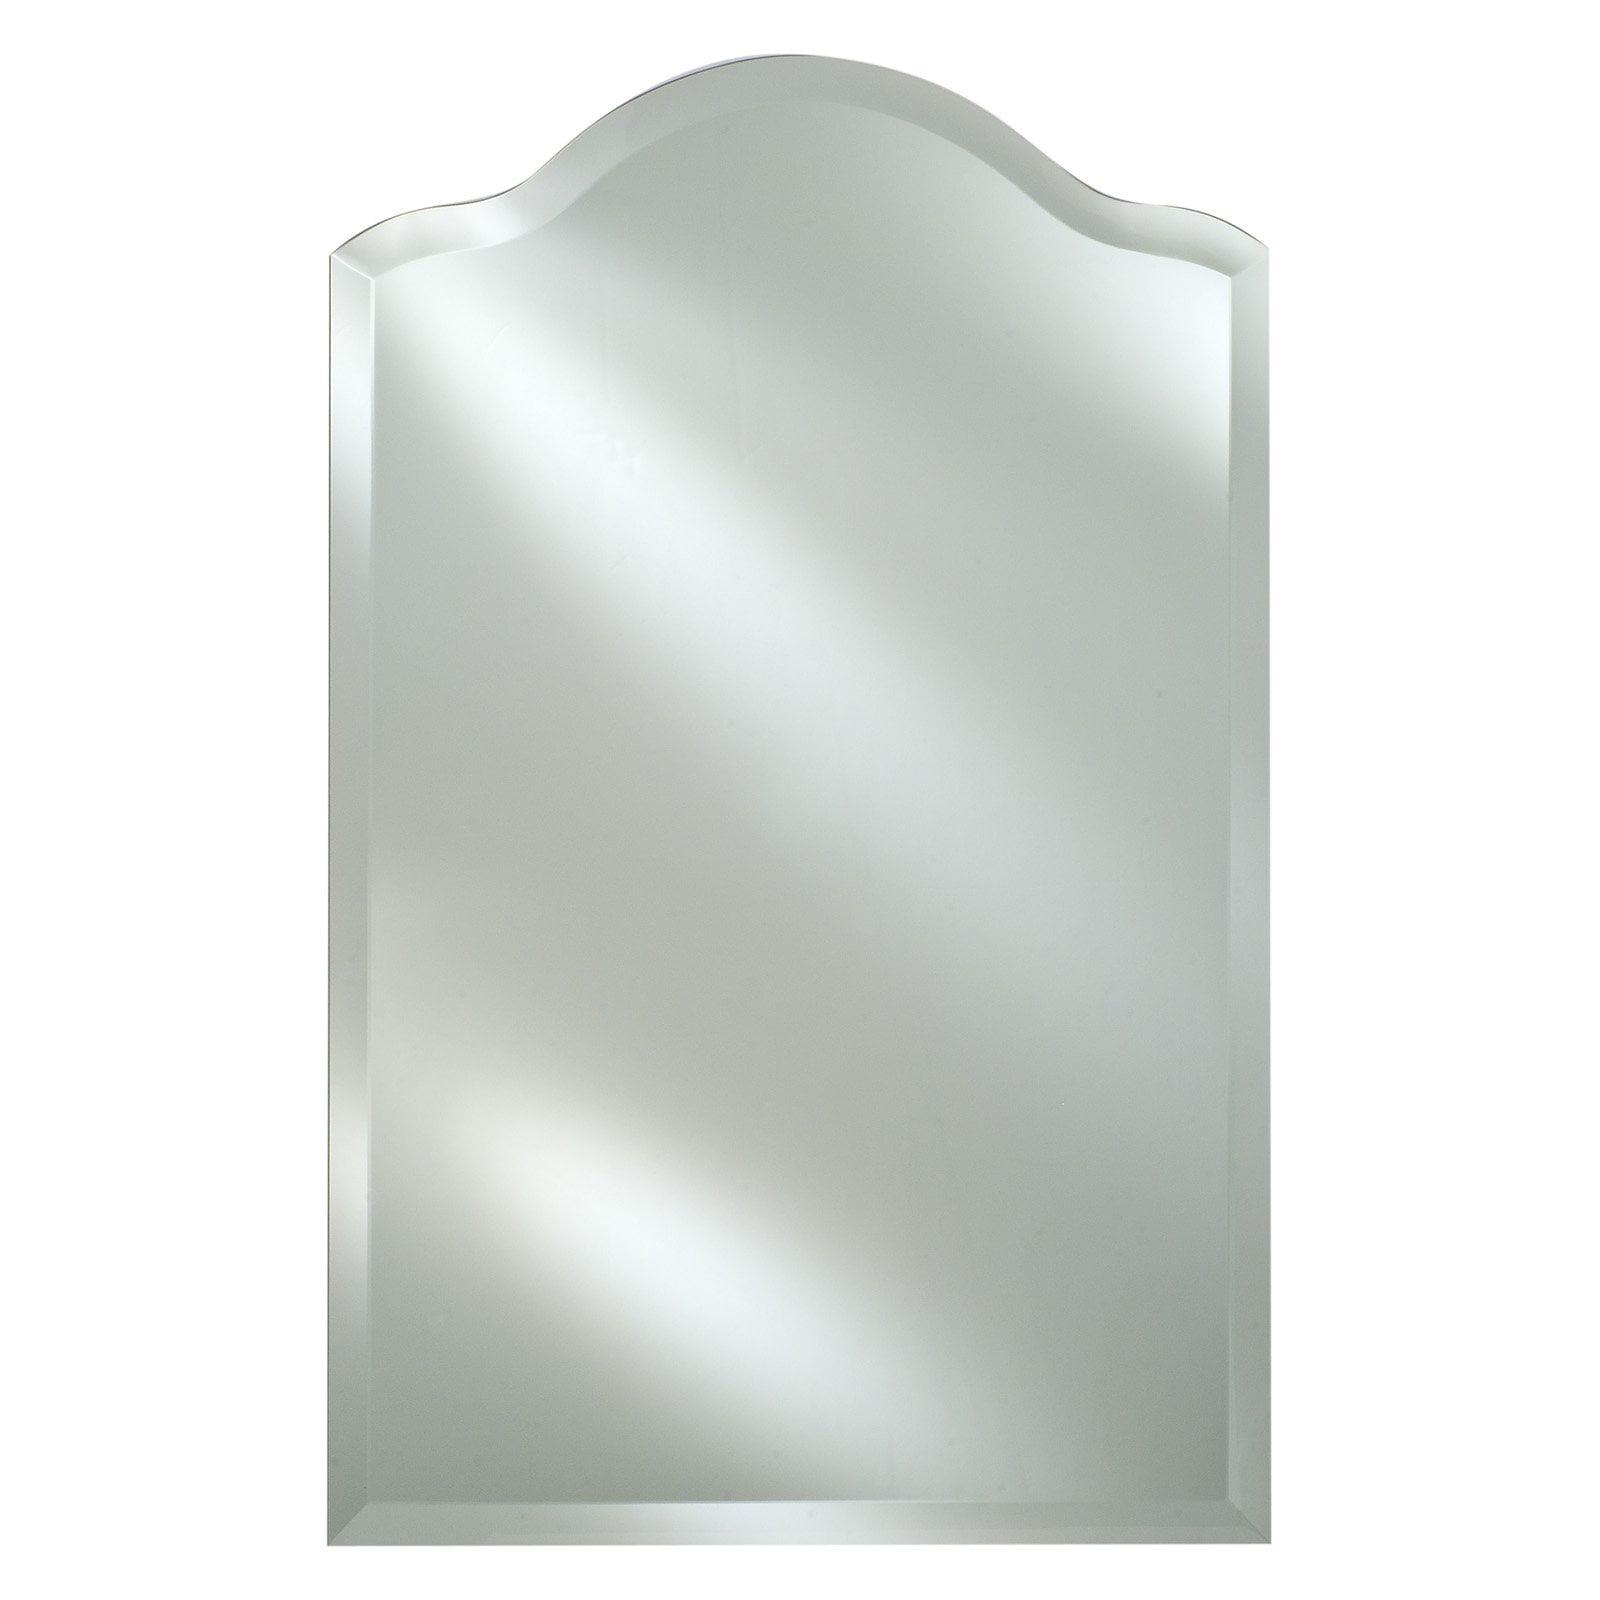 Radiance Frameless Decorative Arch Vanity Wall Mirror